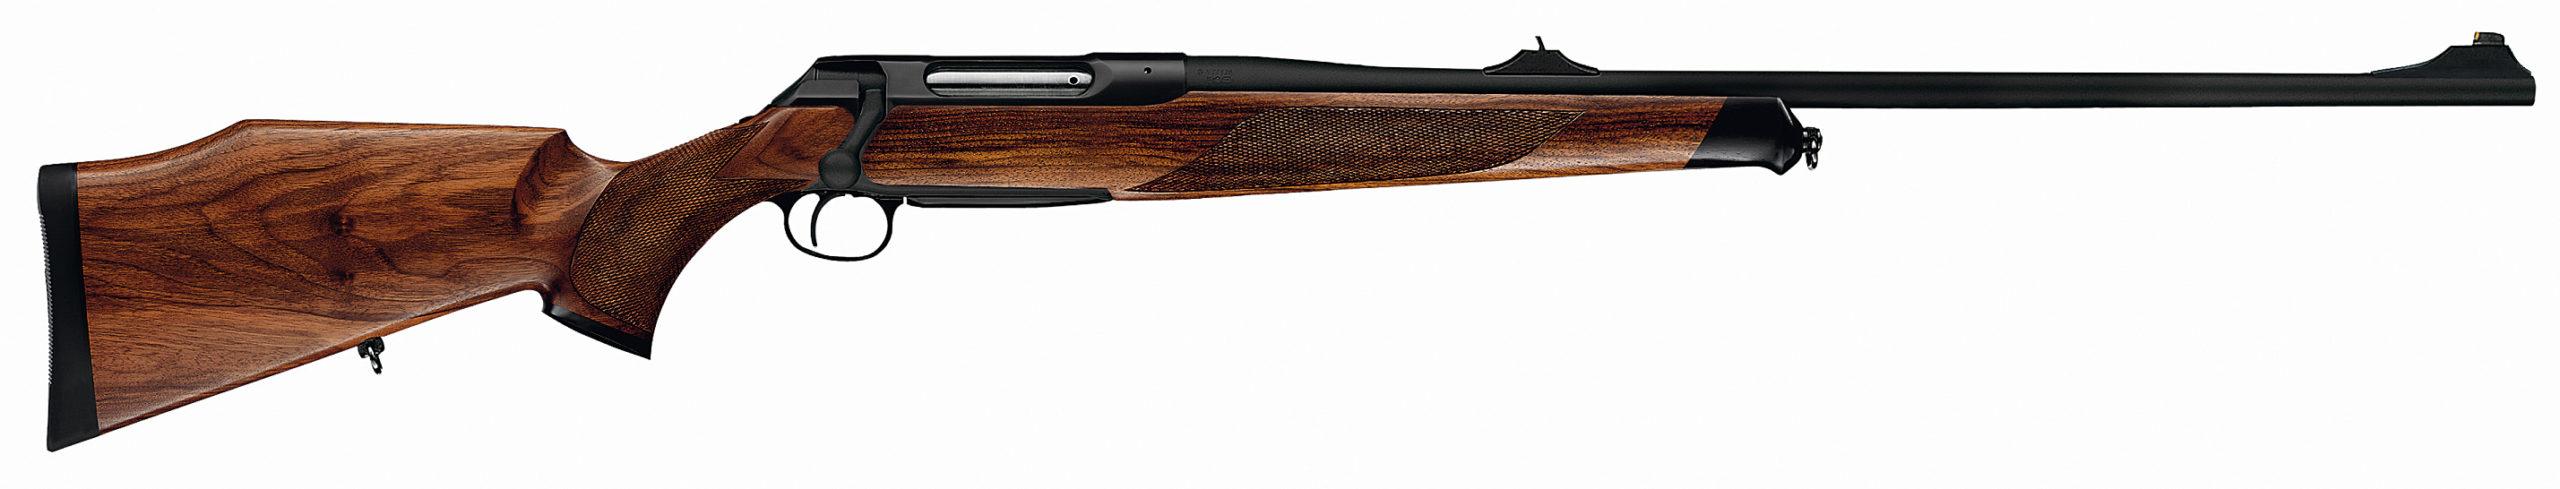 Sauer, la carabine à verrou 202